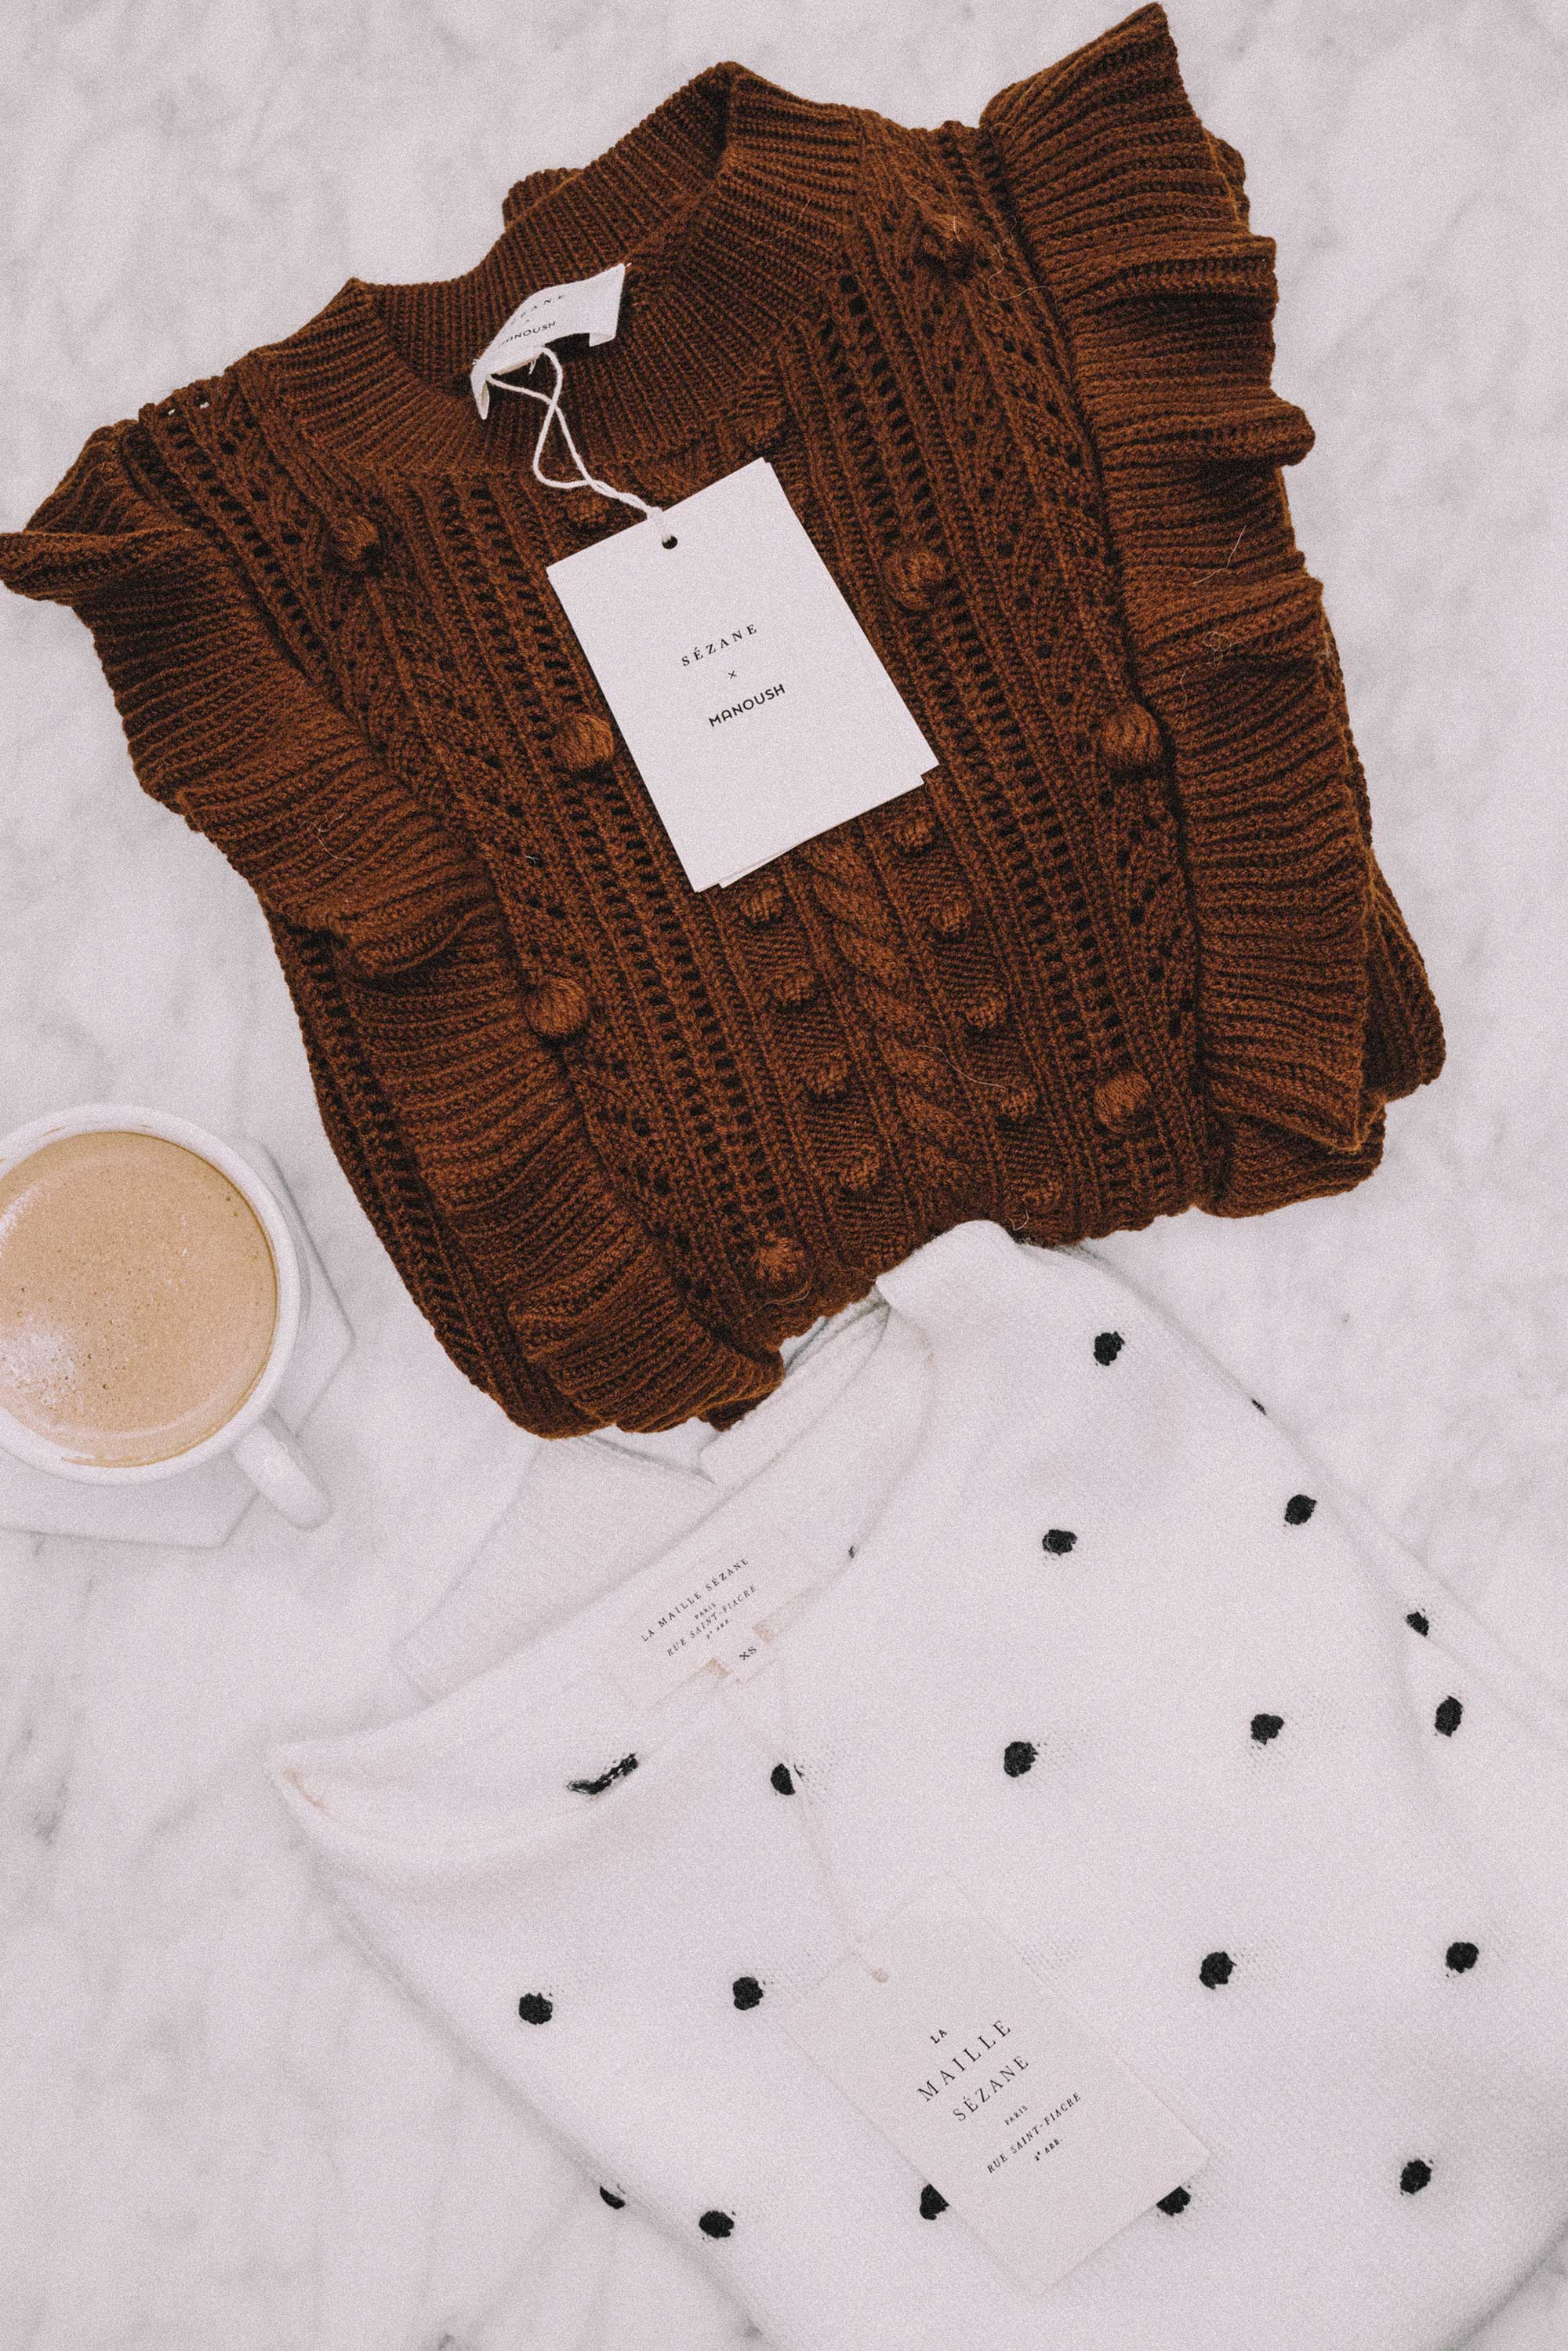 Sezane X Manoush Marva Merino Wool Ruffle Sweater and Sezane Hans Merino Wool Polkadot Sweater2.jpg